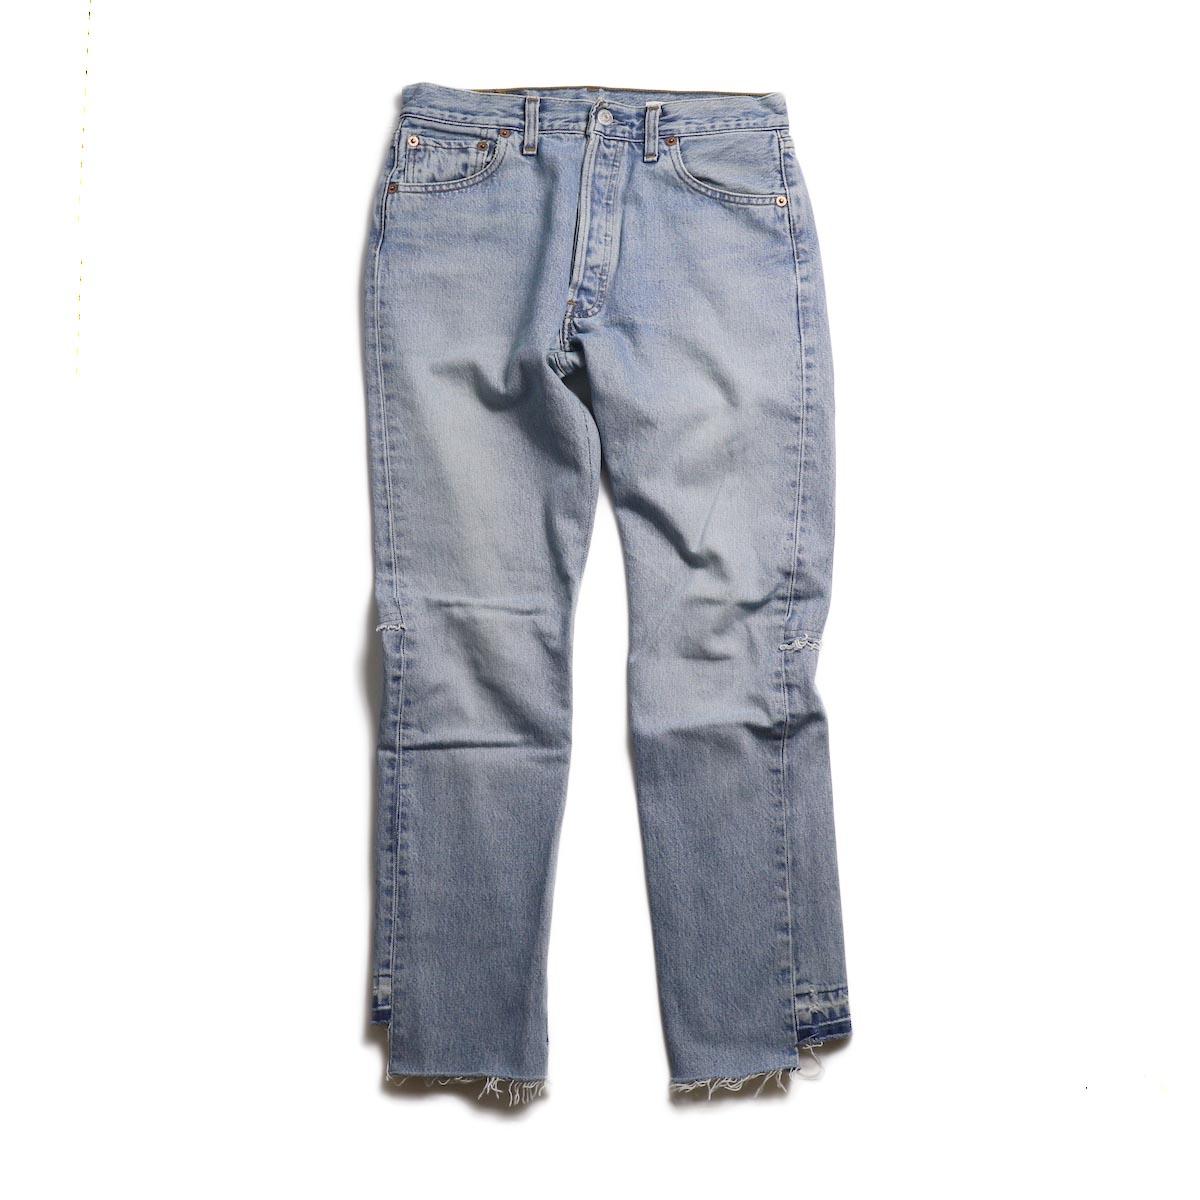 OLD PARK / Back Flare Jeans -Blue Ssize (D)